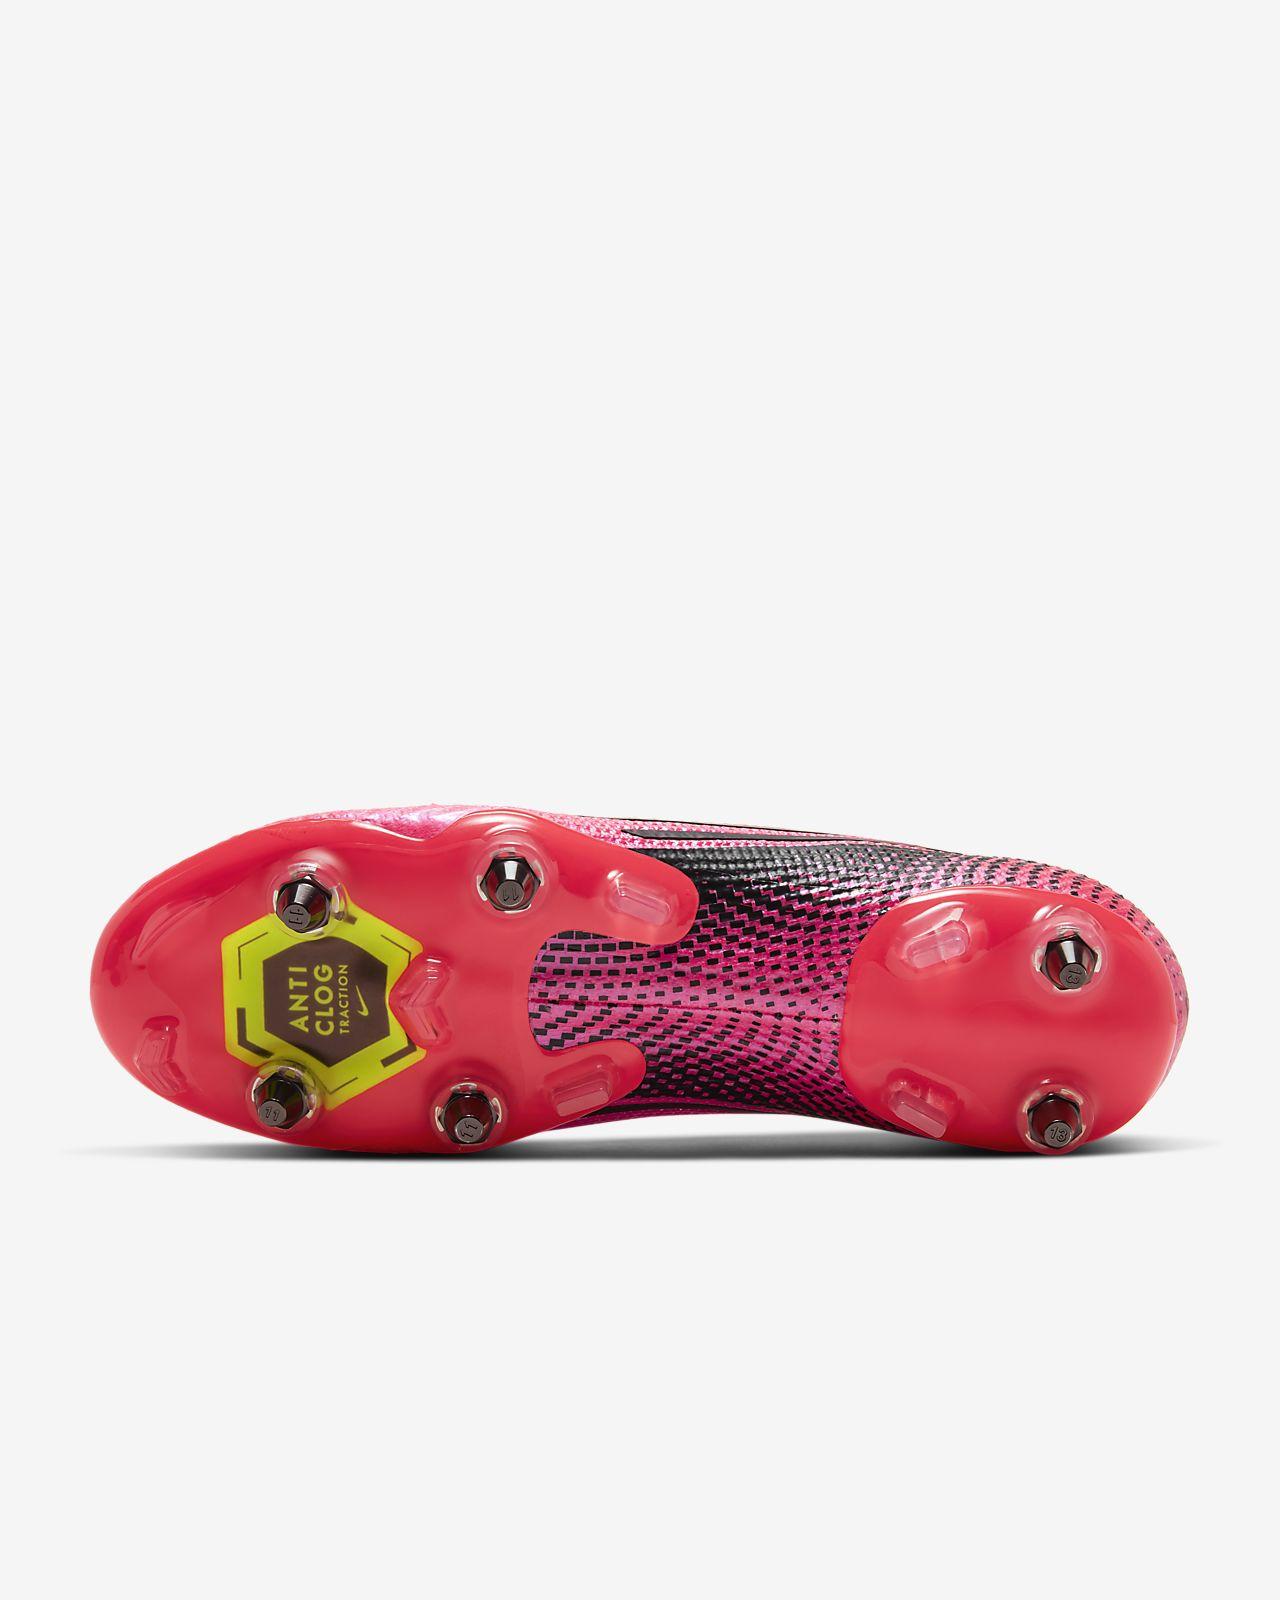 Chaussure de foot Nike Mercurial Vapor XIII Elite SG PRO Anti Clog Traction